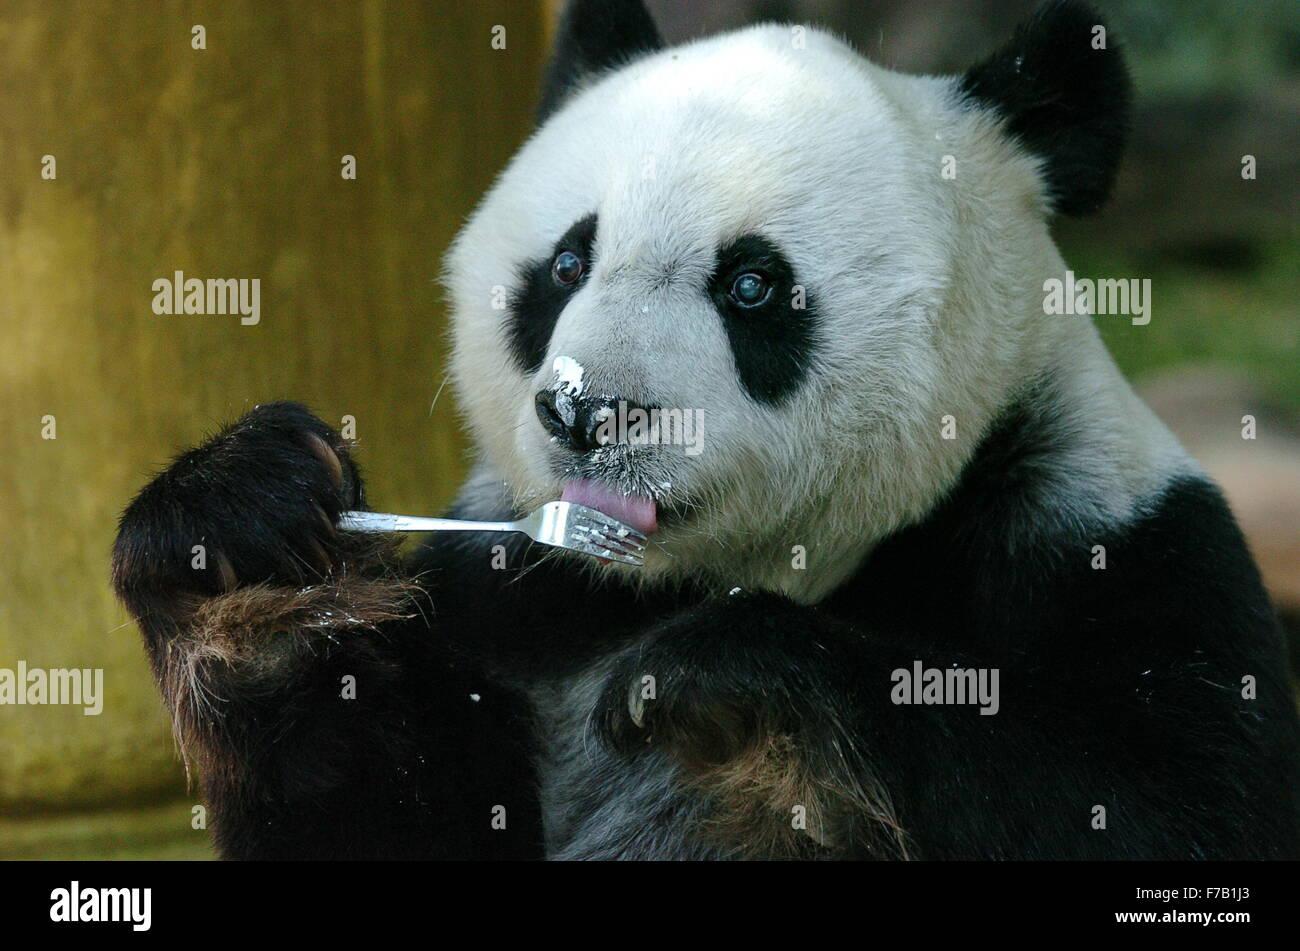 Fuzhou, China. 28th November, 2015. File photo taken on Dec. 18, 2005 shows giant panda Basi eating a cake at the Stock Photo